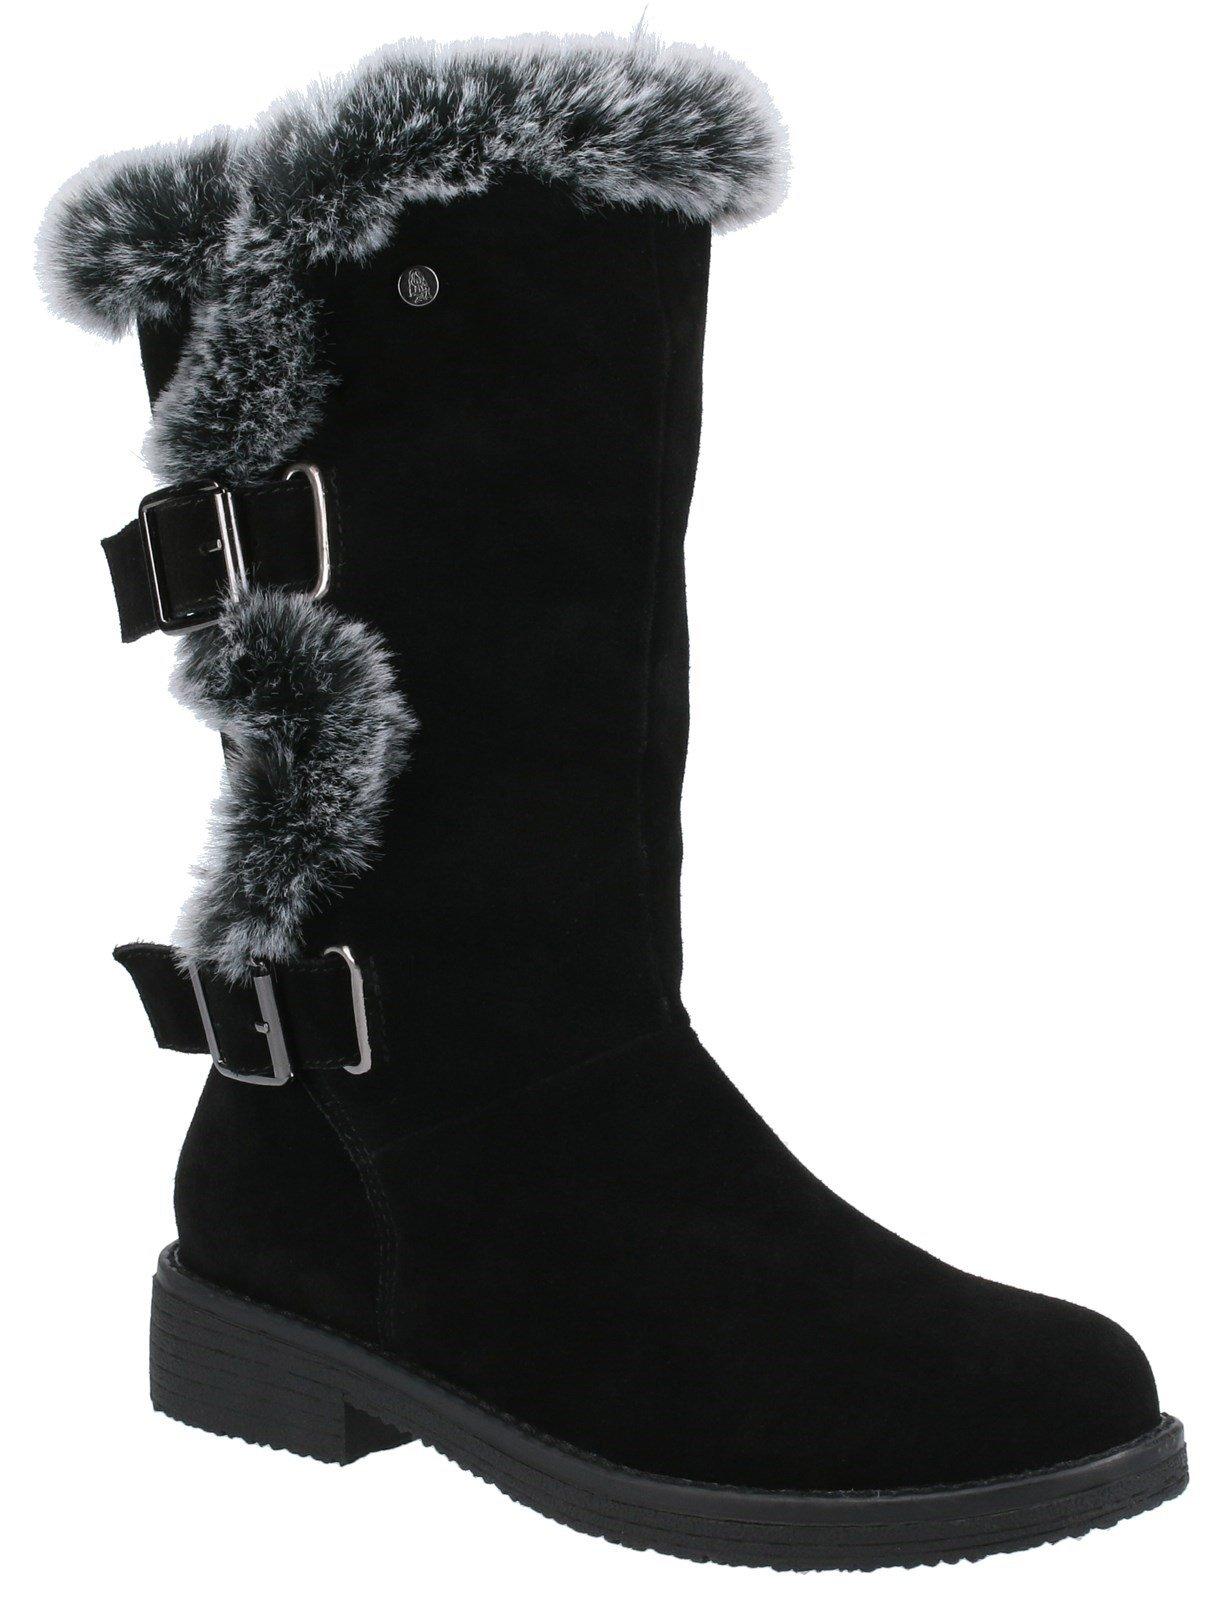 Hush Puppies Women's Megan Mid Boots Various Colours 31217 - Black 3